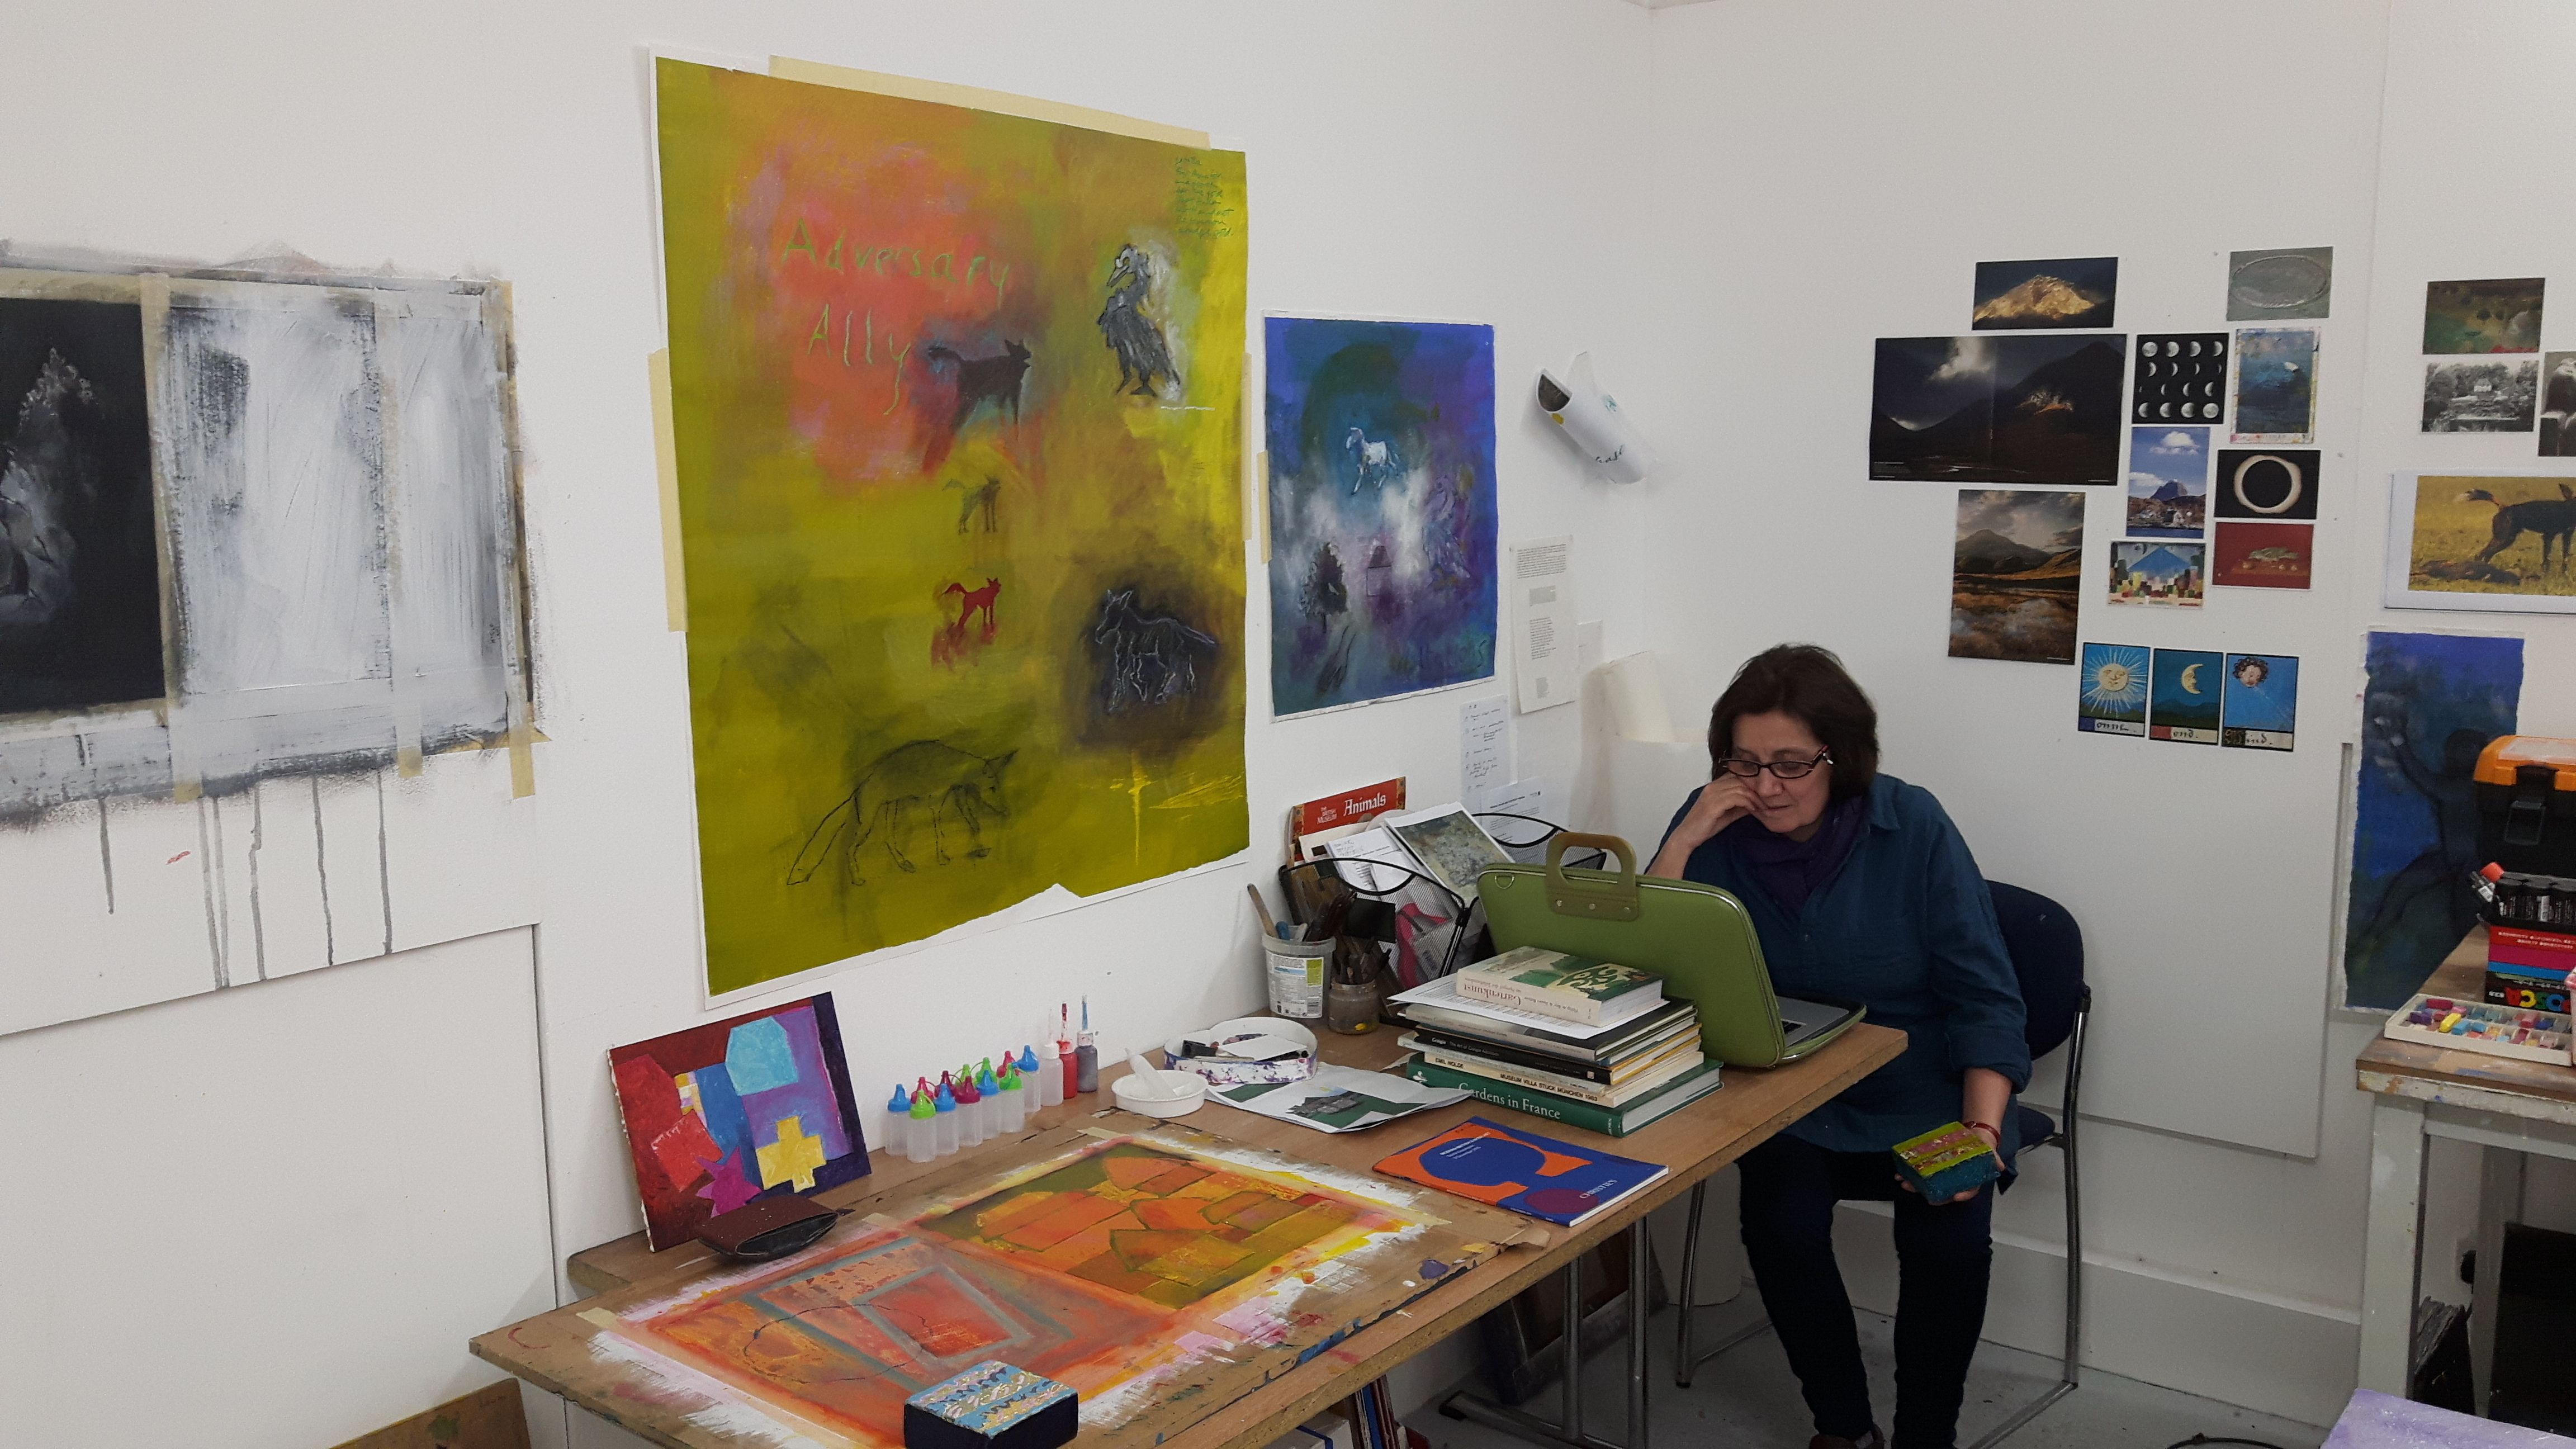 Deborah ravetz student visual arts mfa feb 2016 https